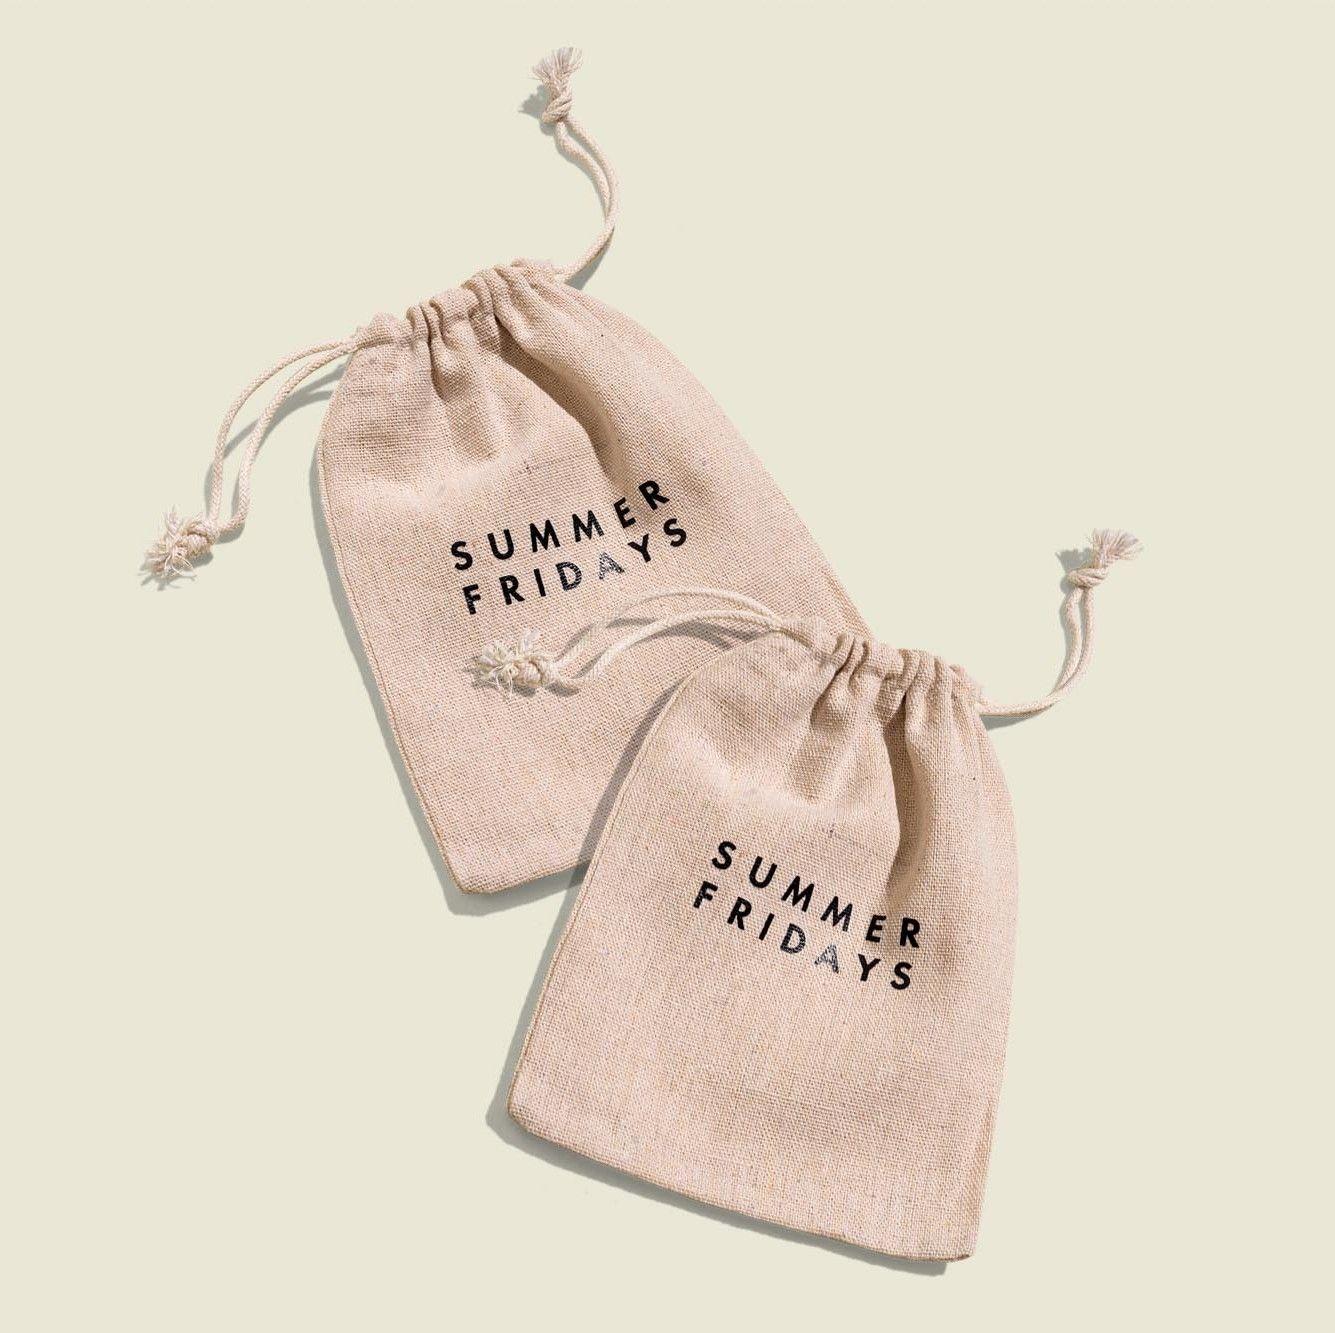 Set of drawstring pouches